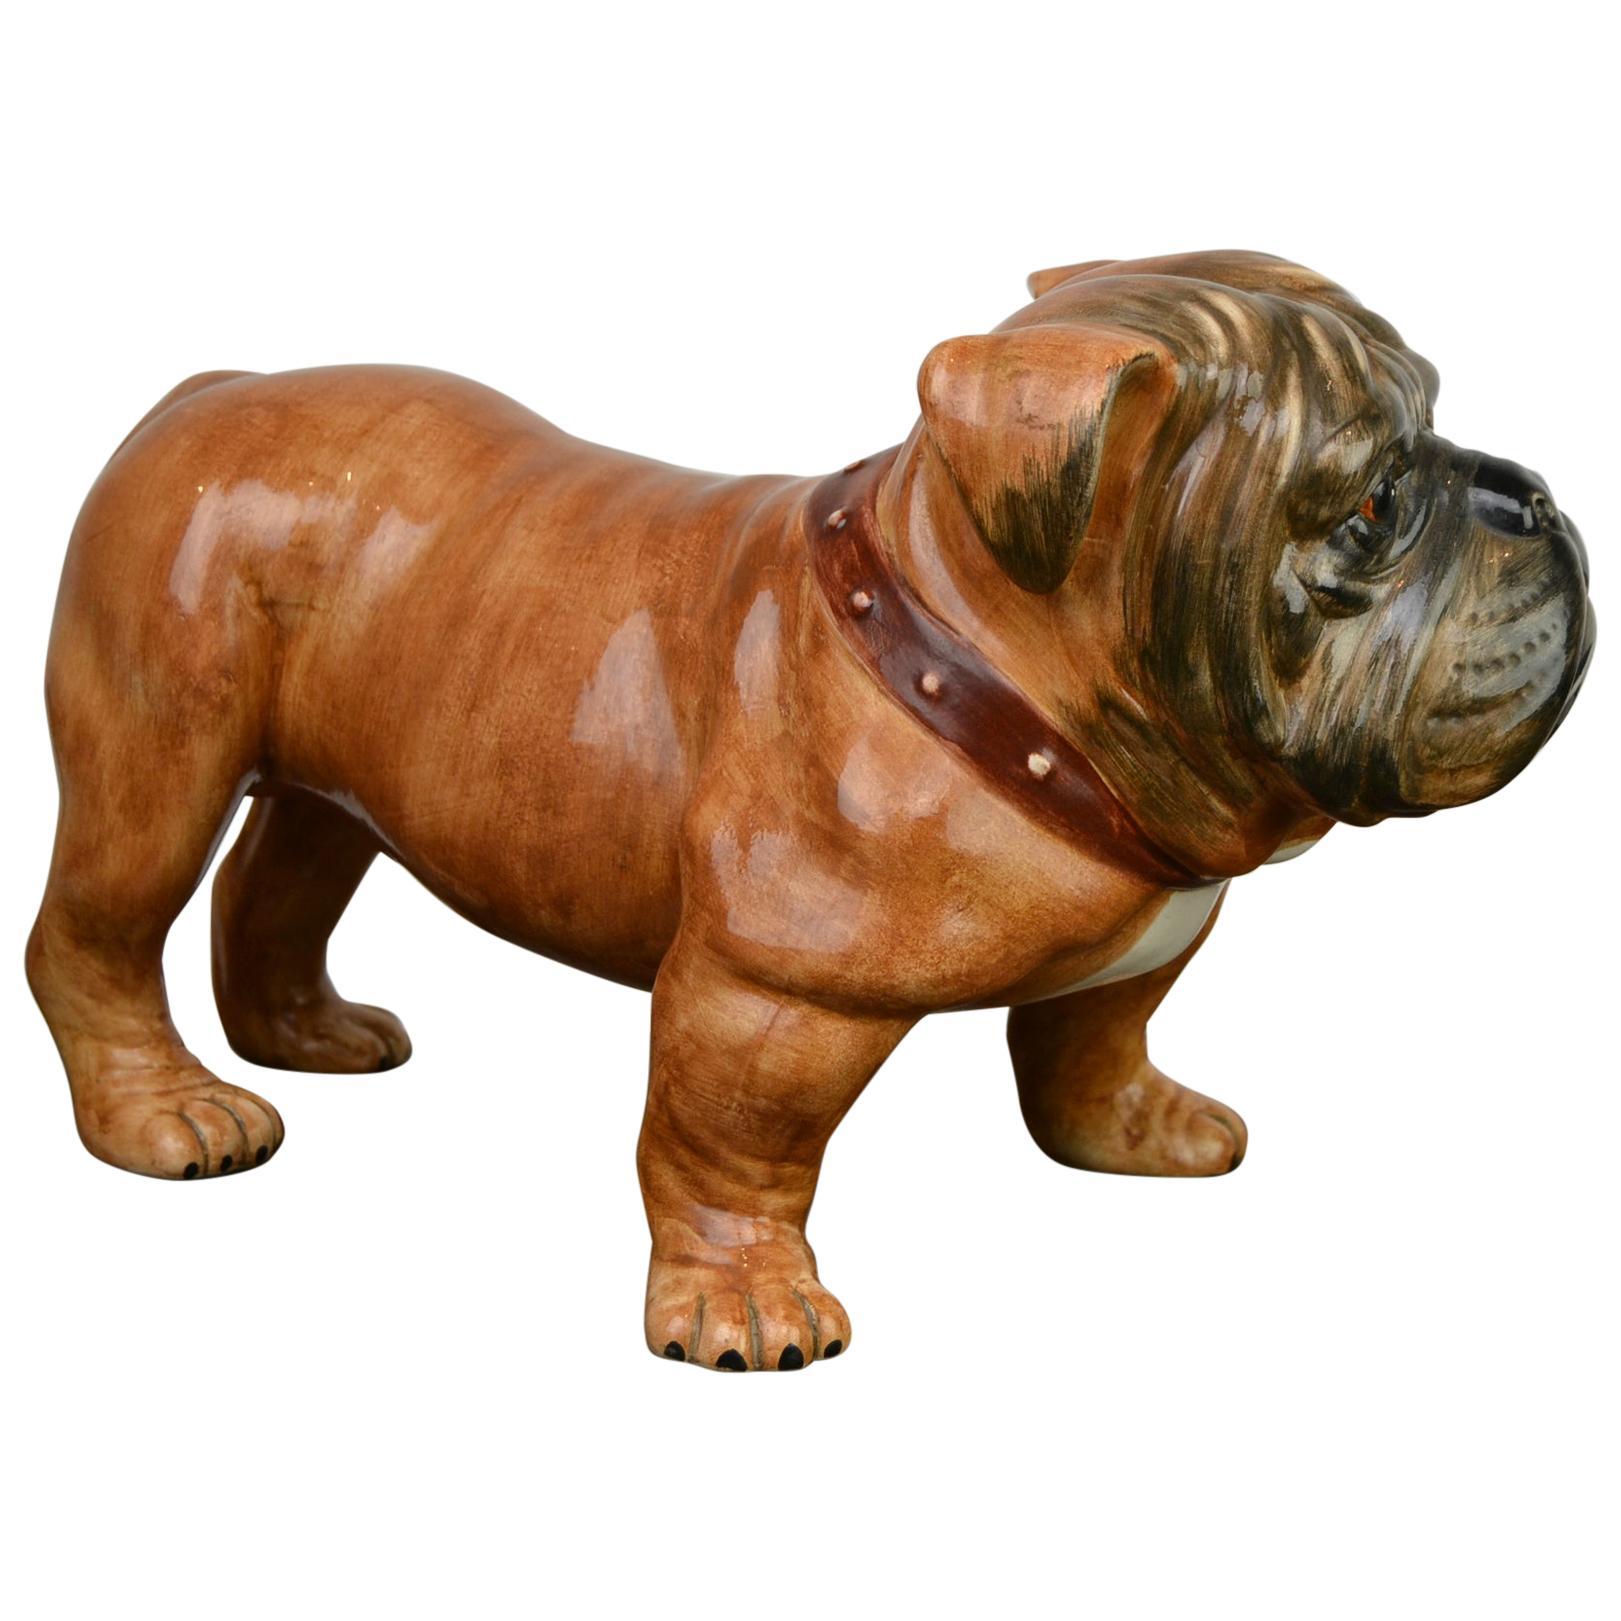 Large Ceramic English Bulldog Sculpture, Late 20th Century, Italy